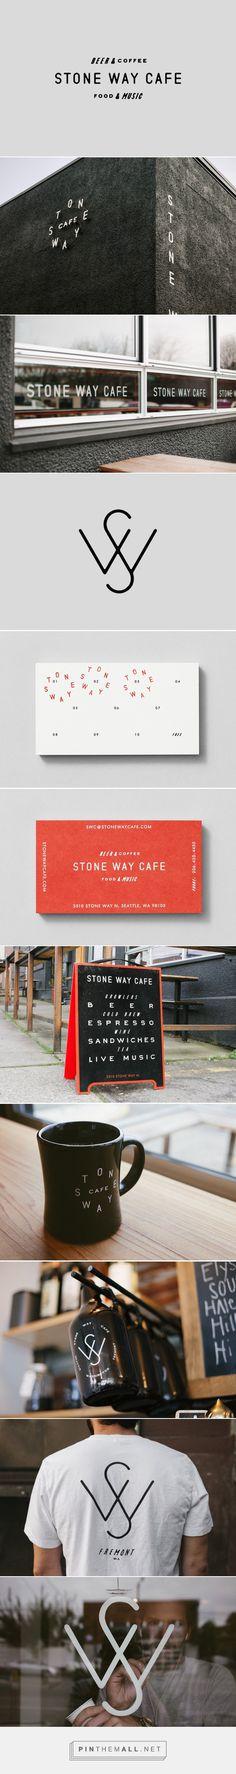 Stone Way Café